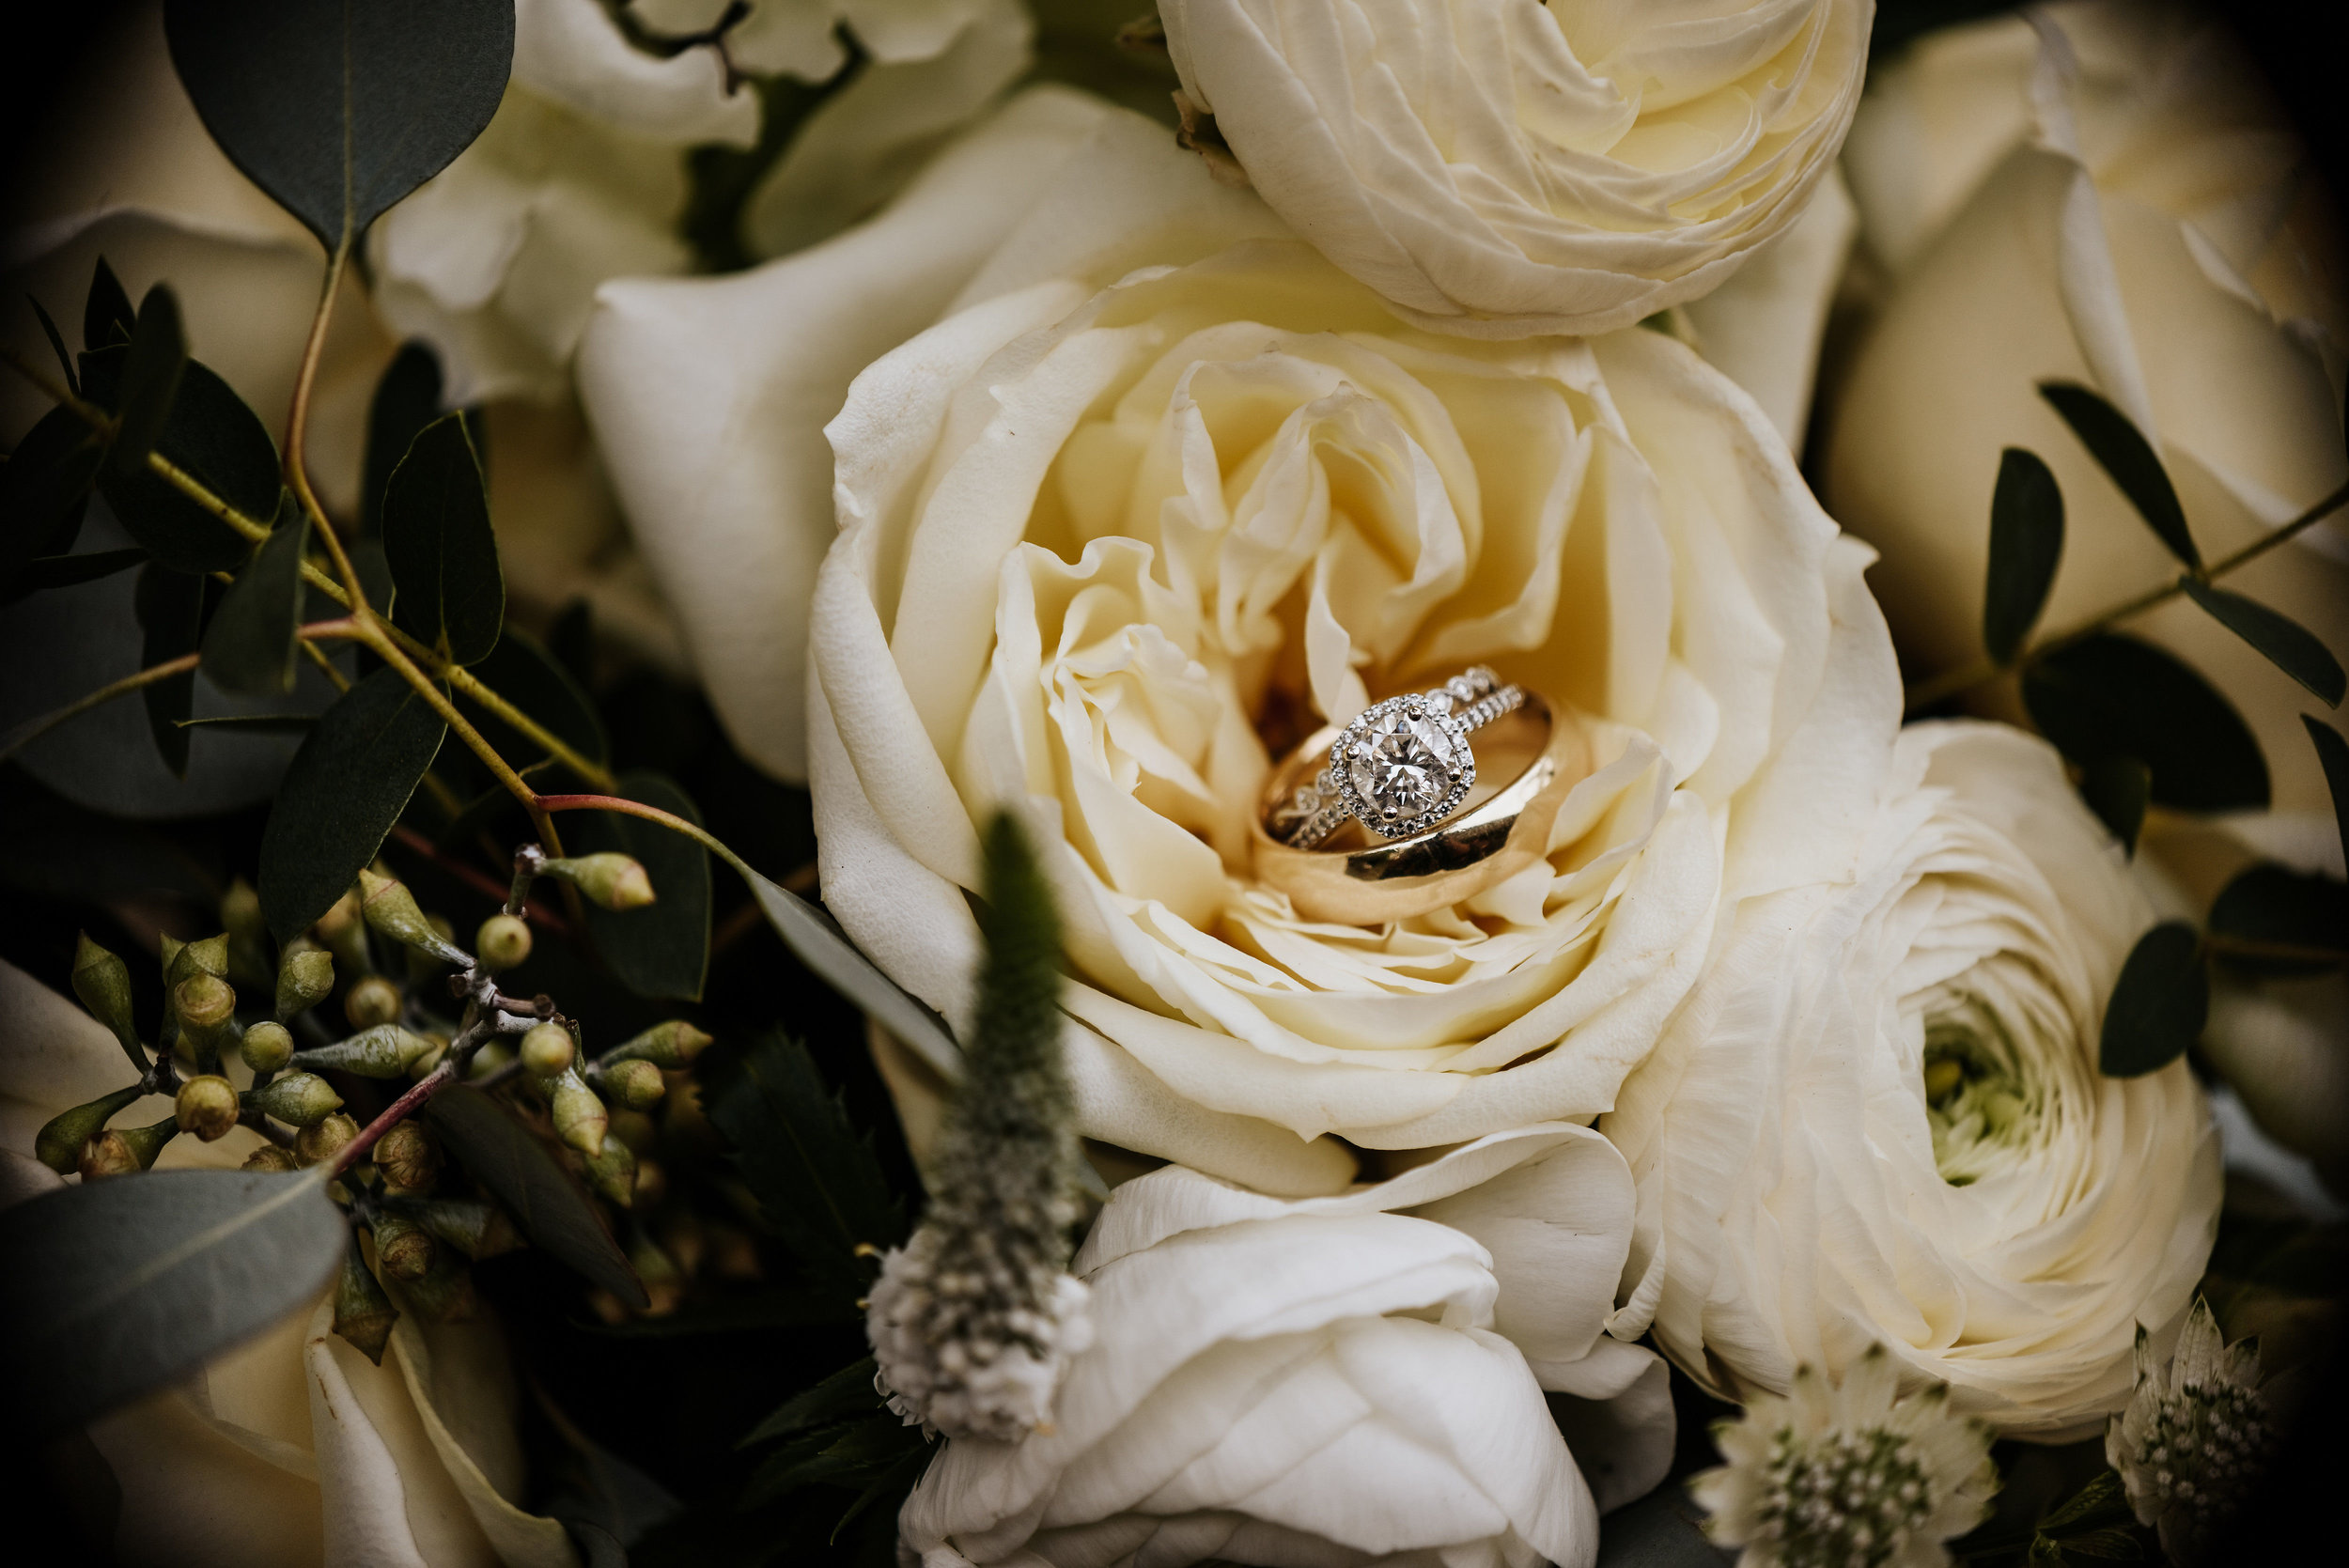 Mikenzi_Brad_Wedding_The_Delamater_House_New_Smyrna_Beach_Florida_Photography_by_V_9694.jpg